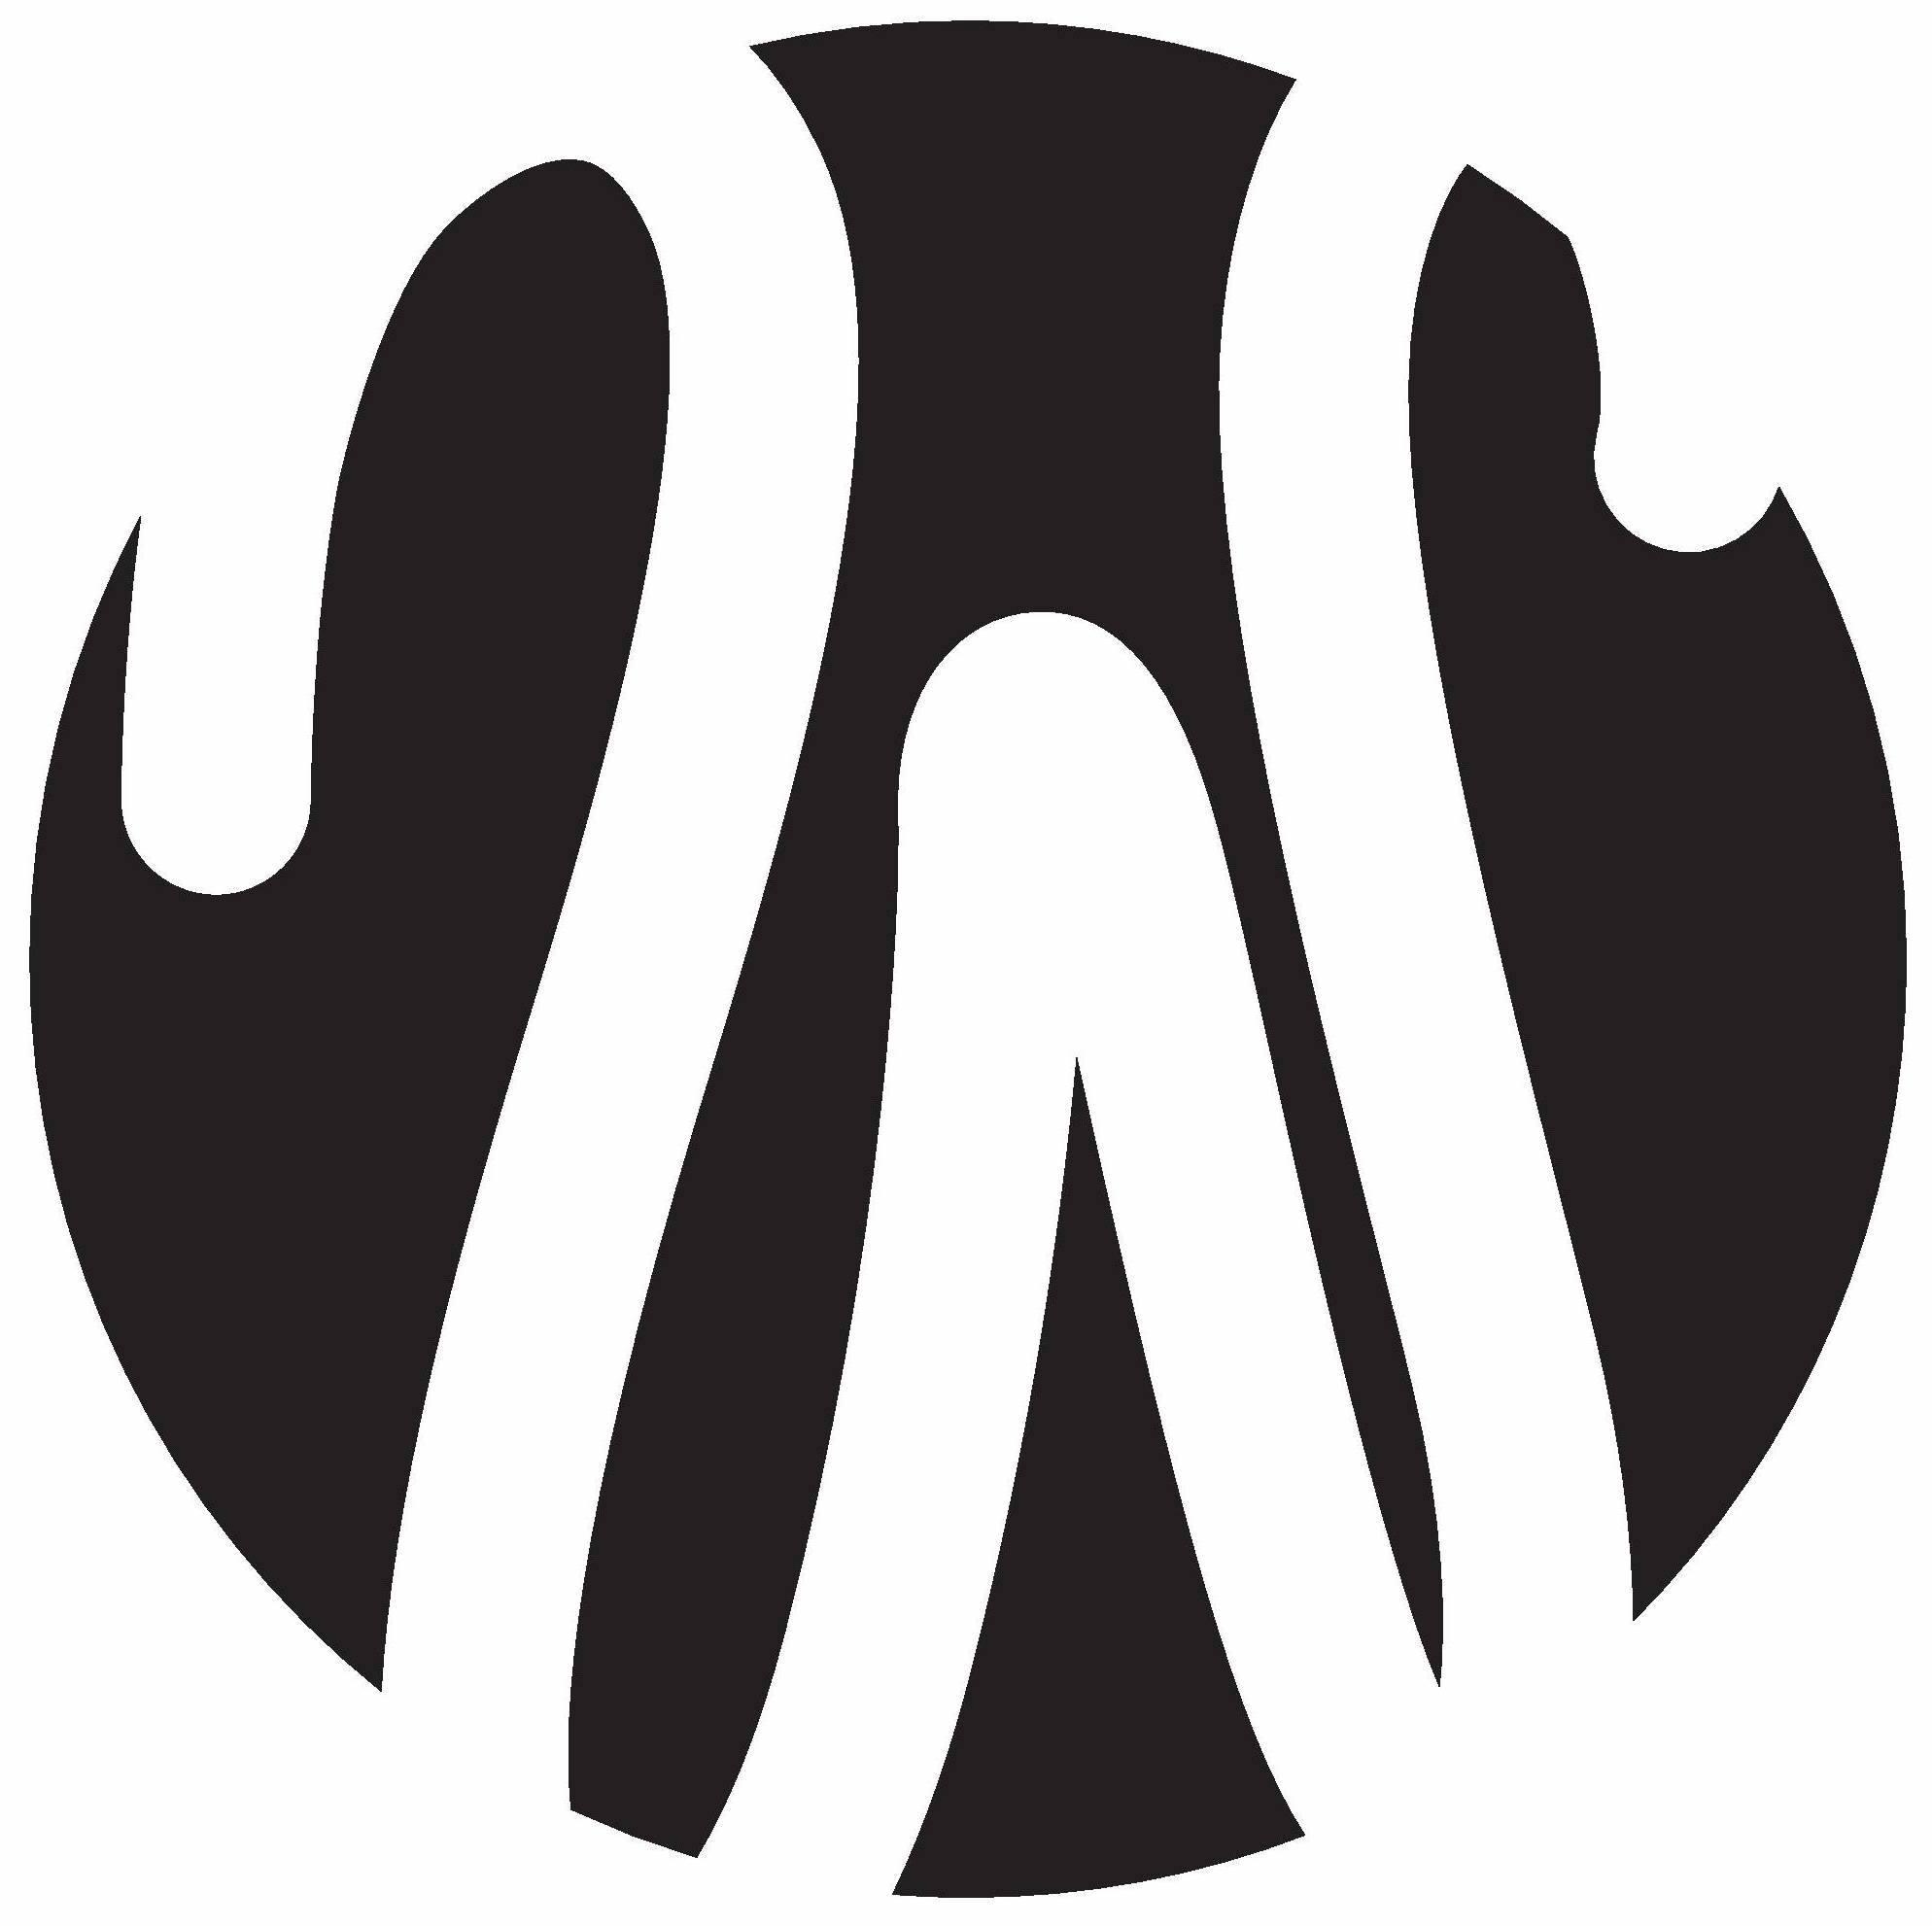 Wearbox logo